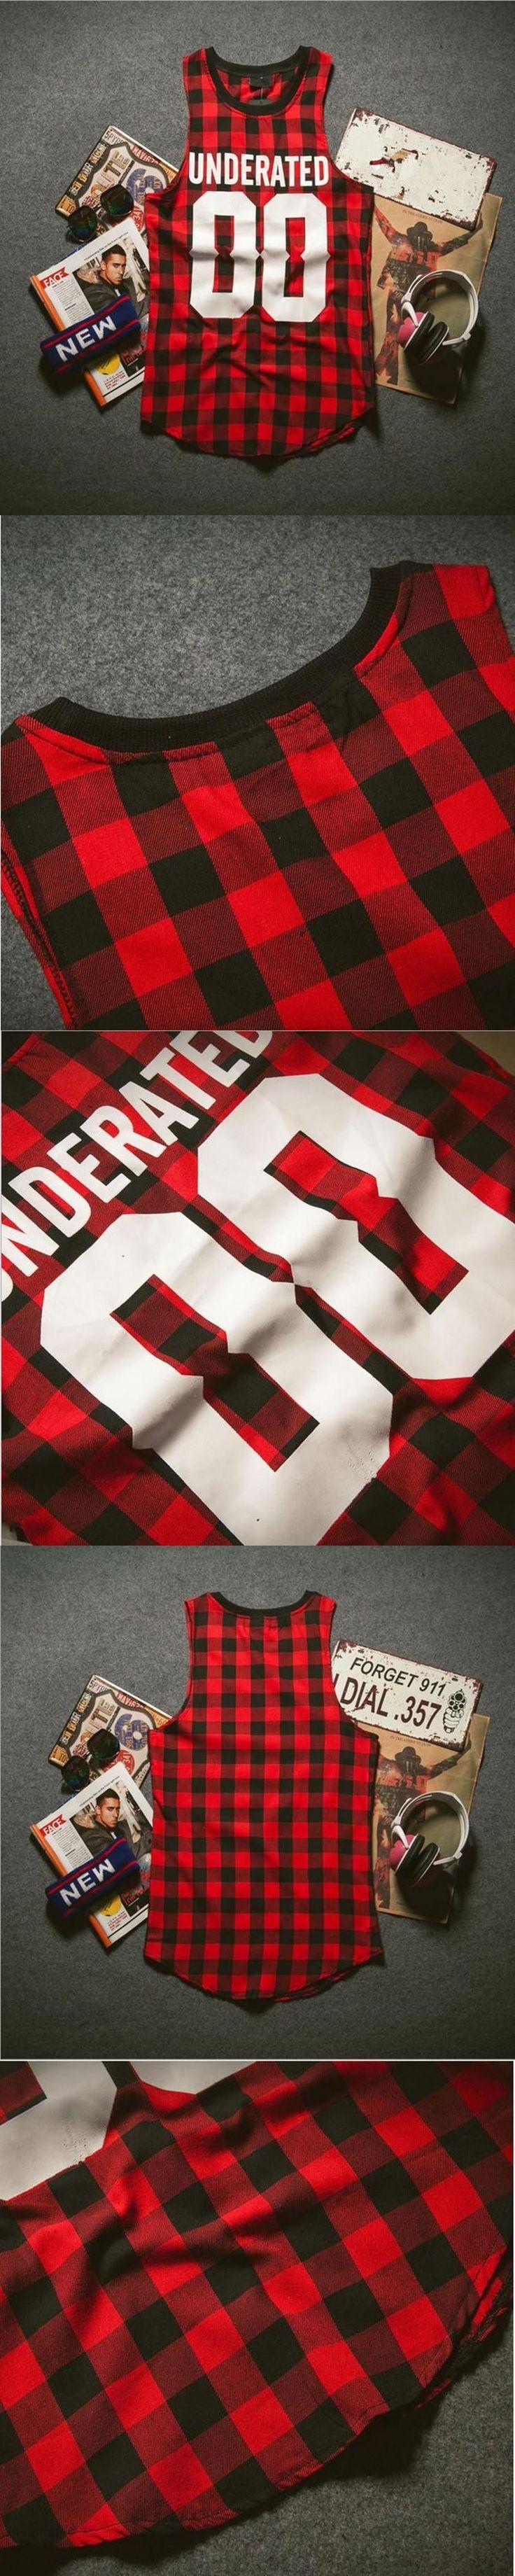 Hot sale 2017 UNDERATED Bandana Men's Extended Tee Shirts Men Skateboard Element t-shirt Hip Hop plaid vest Streetwear Clothing